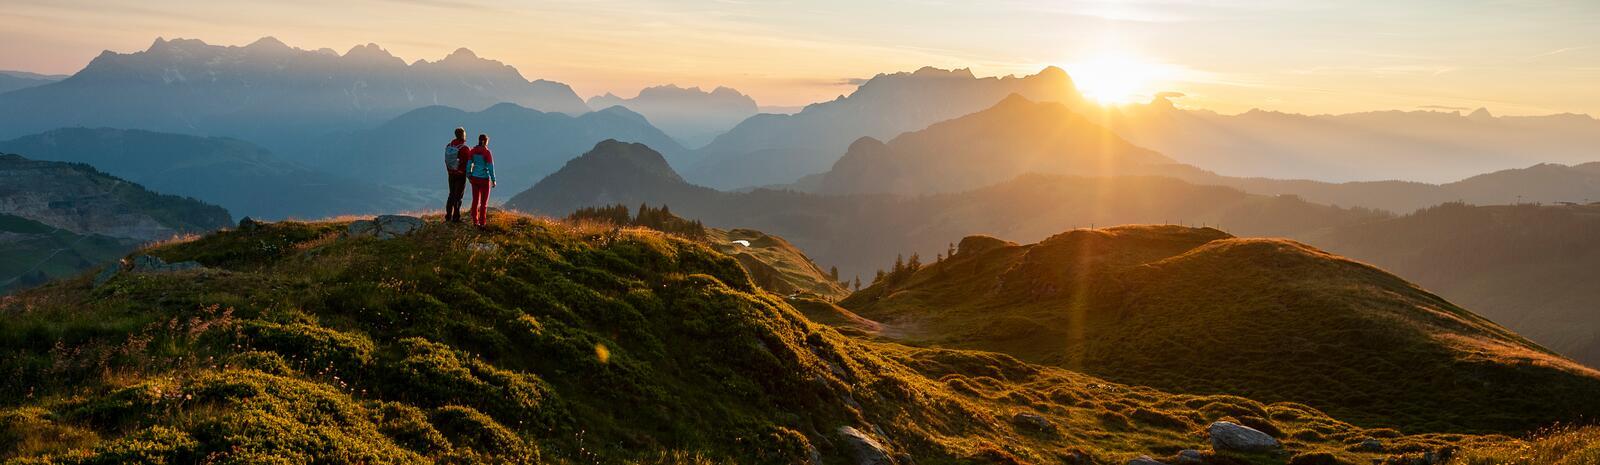 Bergpanorama im Herbst bei Sonnenuntergang